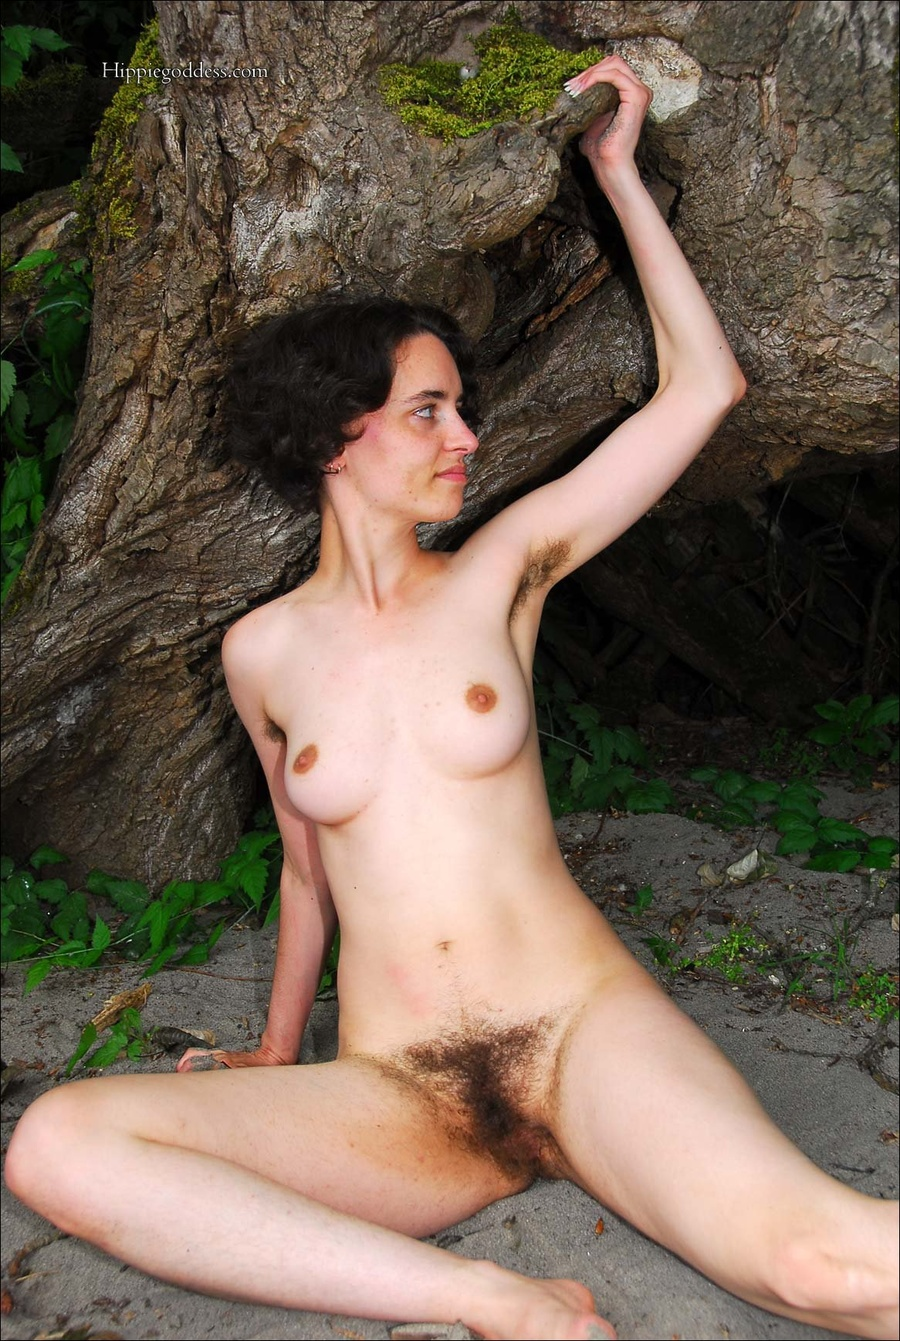 Www xxxx super hairy armpit porno vagina net com